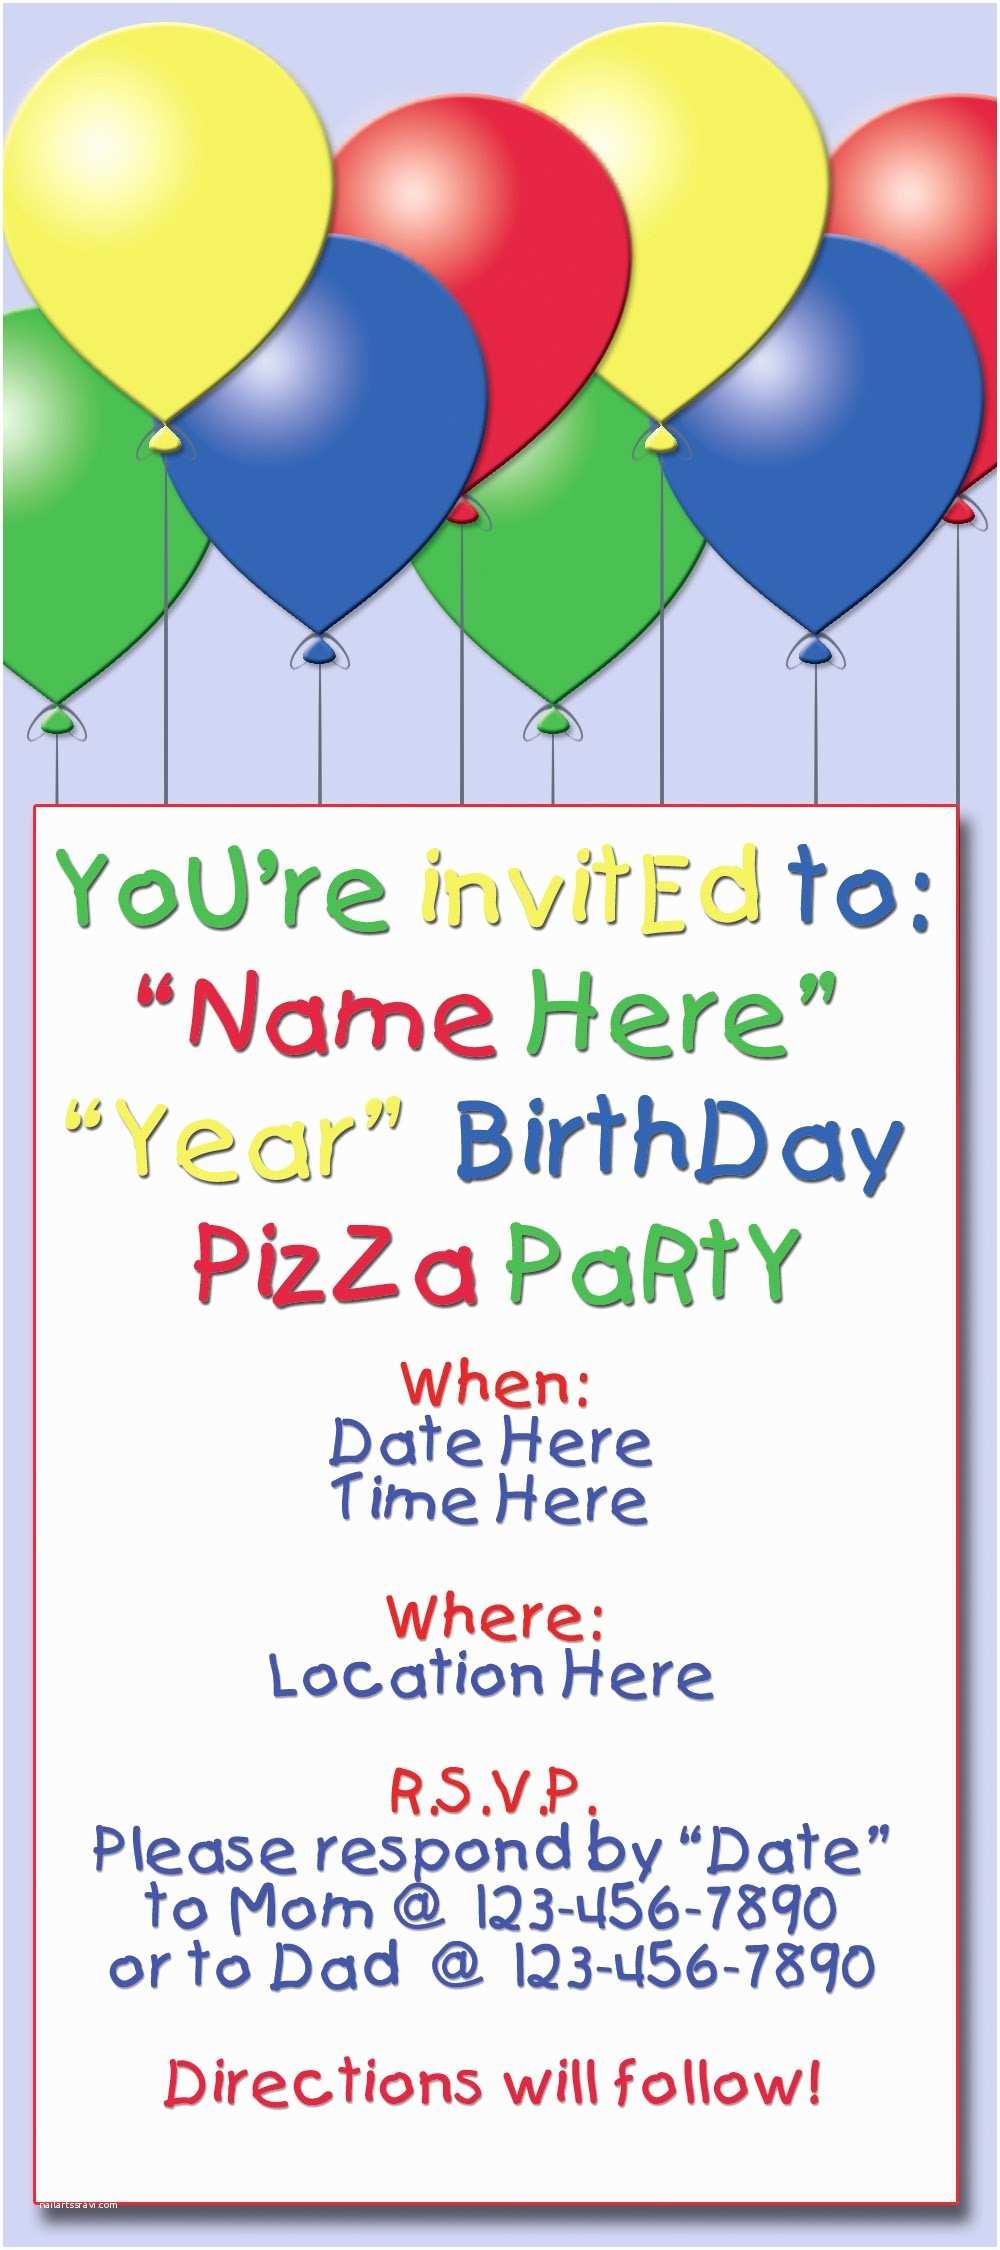 Sample Birthday Invitation My Design solutions Samples